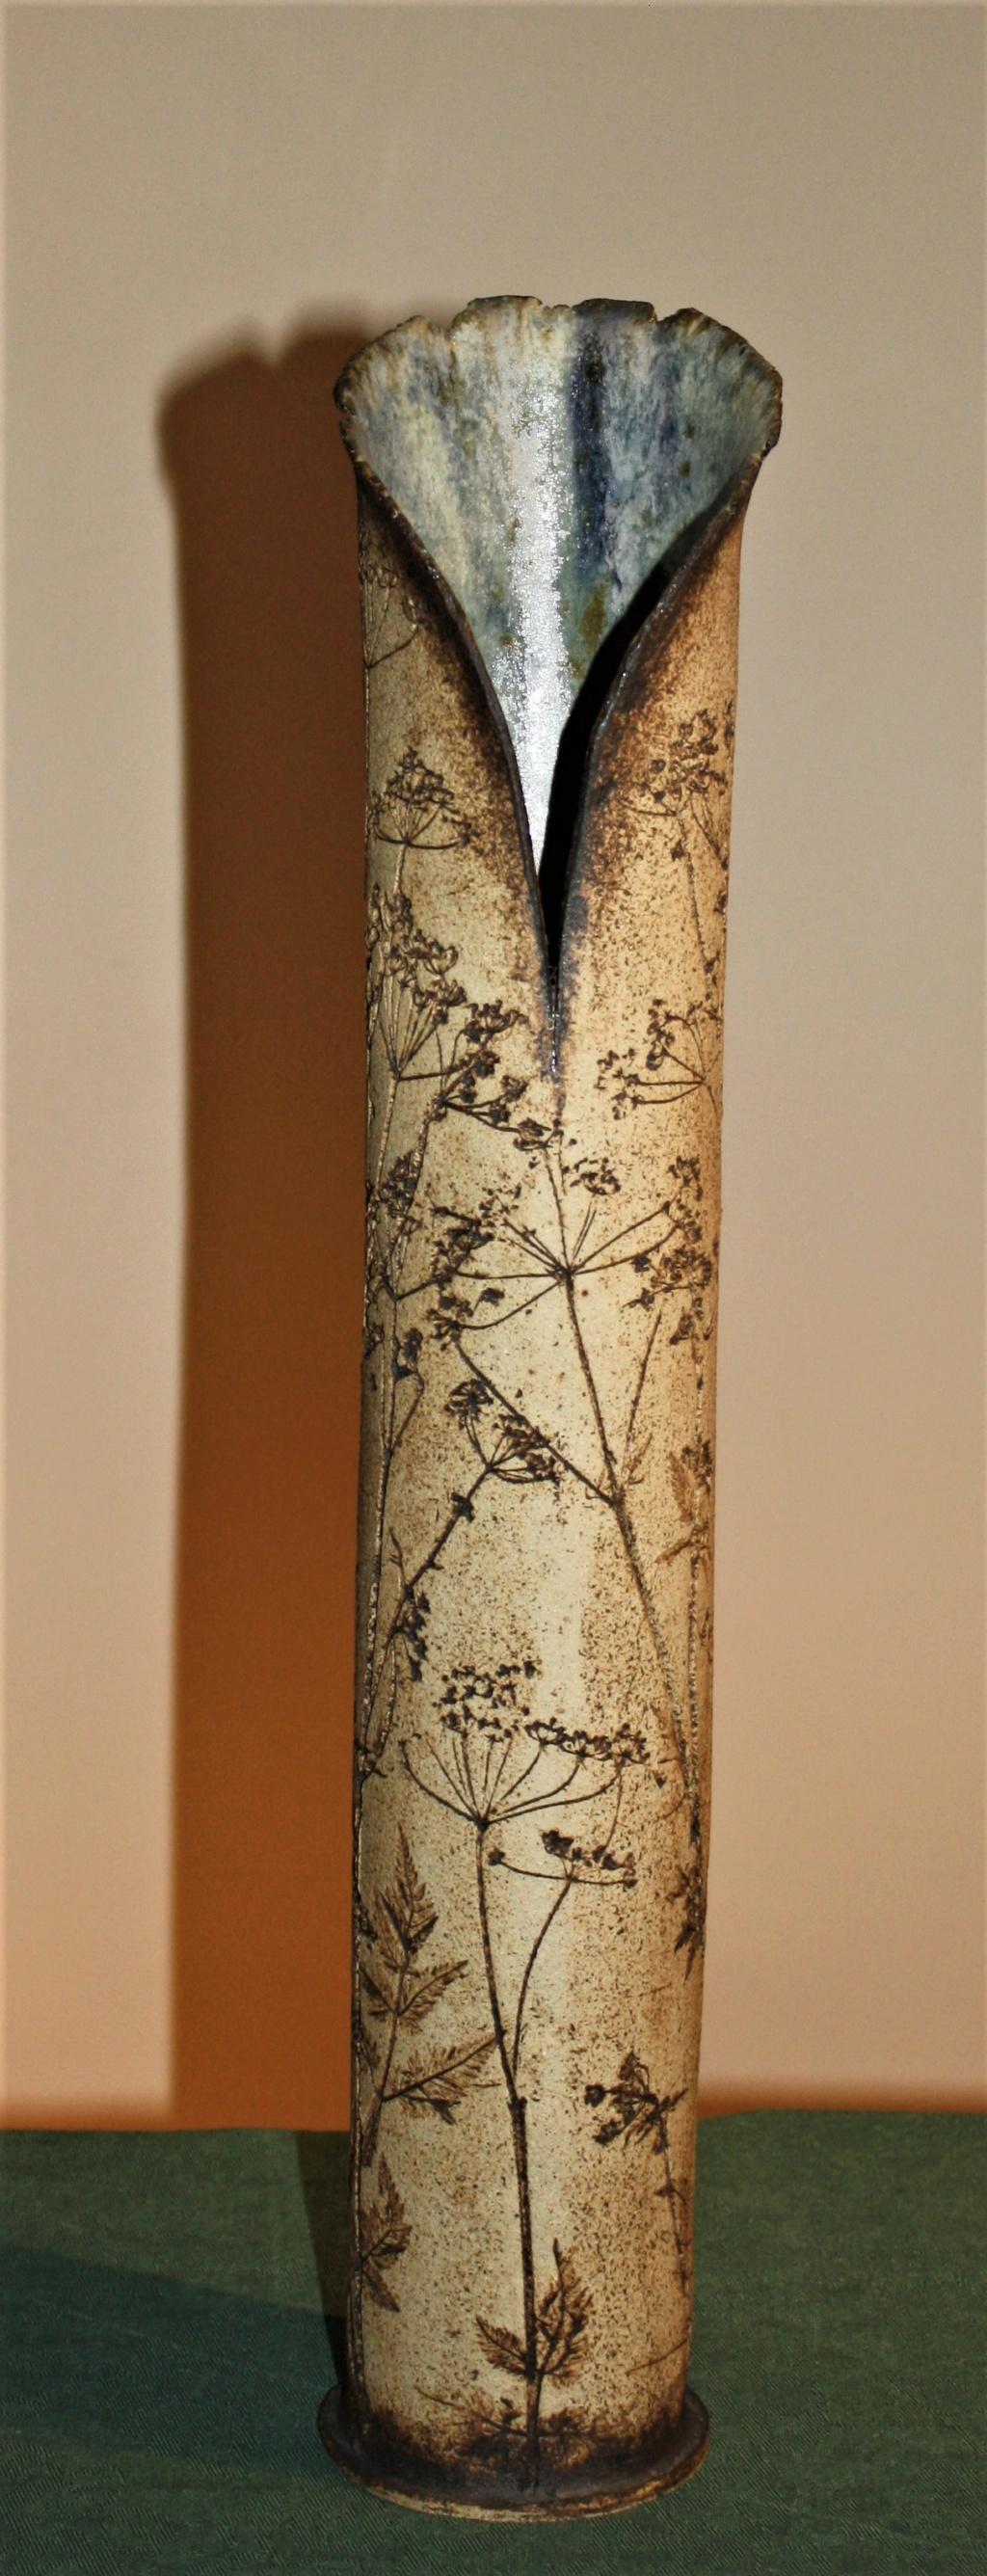 Fabulous tall vase potters mark looks like a G any ideas? Tall_s13